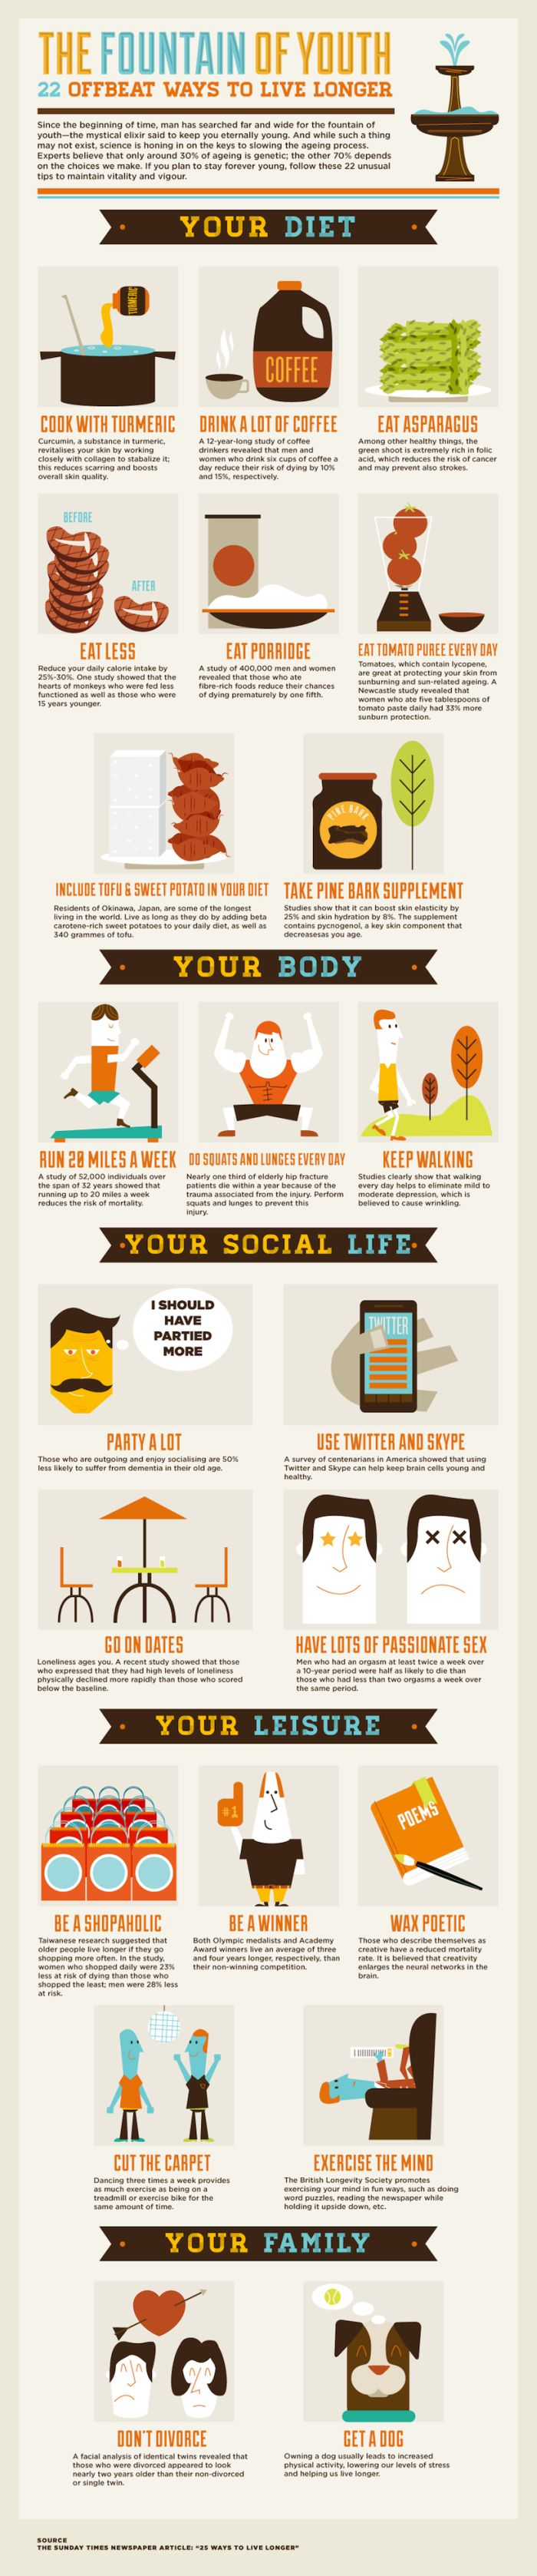 live_longer_infographic_01